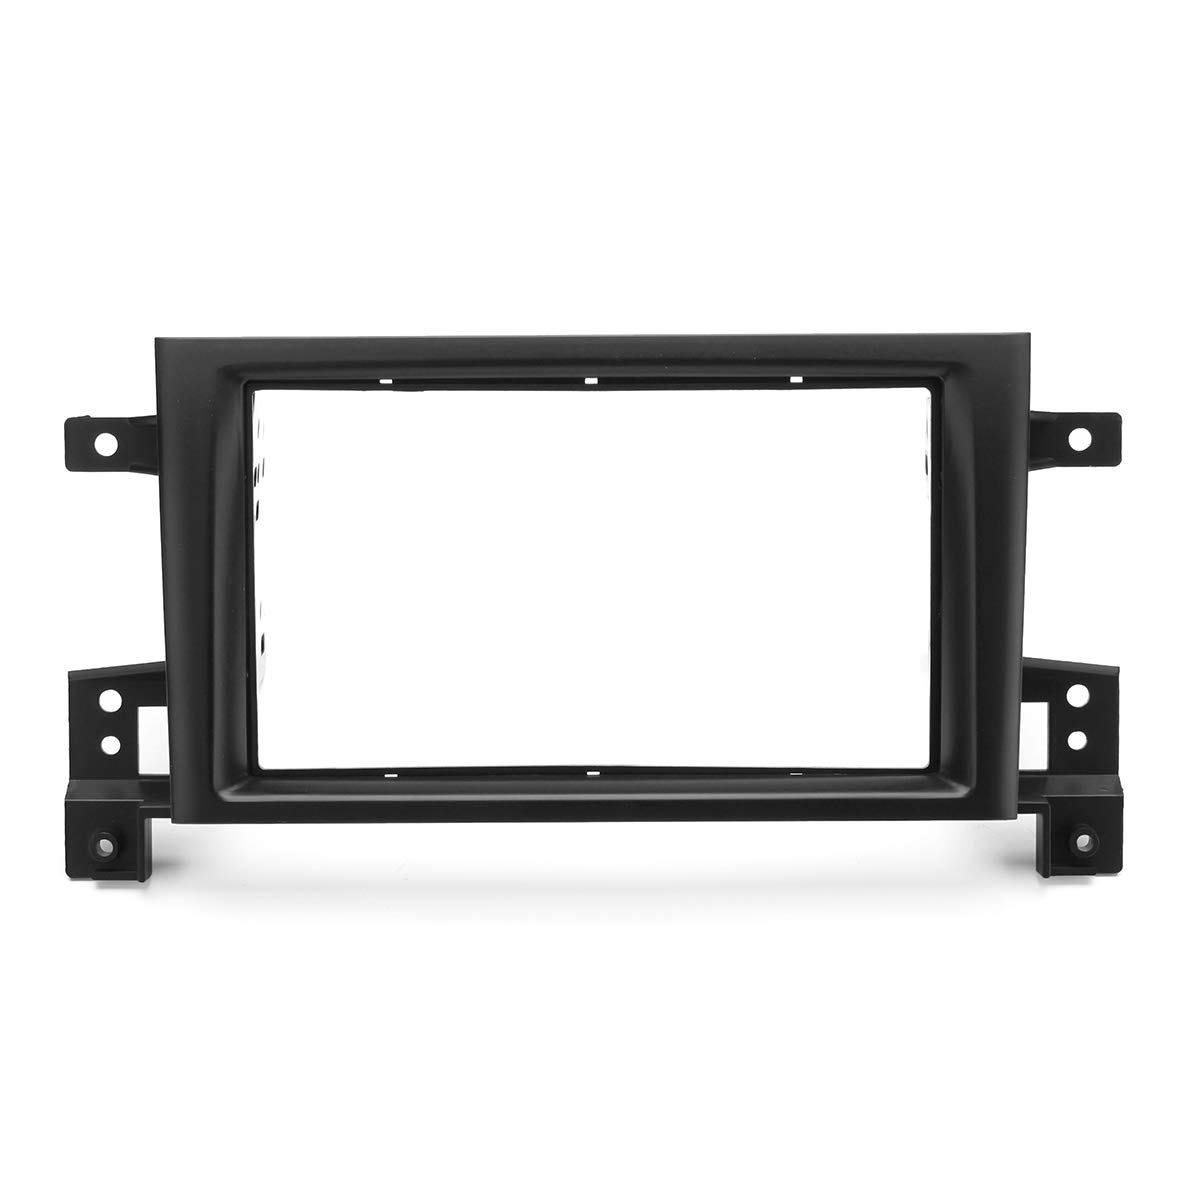 Hitommy 2Din Car Stereo Panel Plate Frame Kit for Suzuki Grand Vitara 2015+